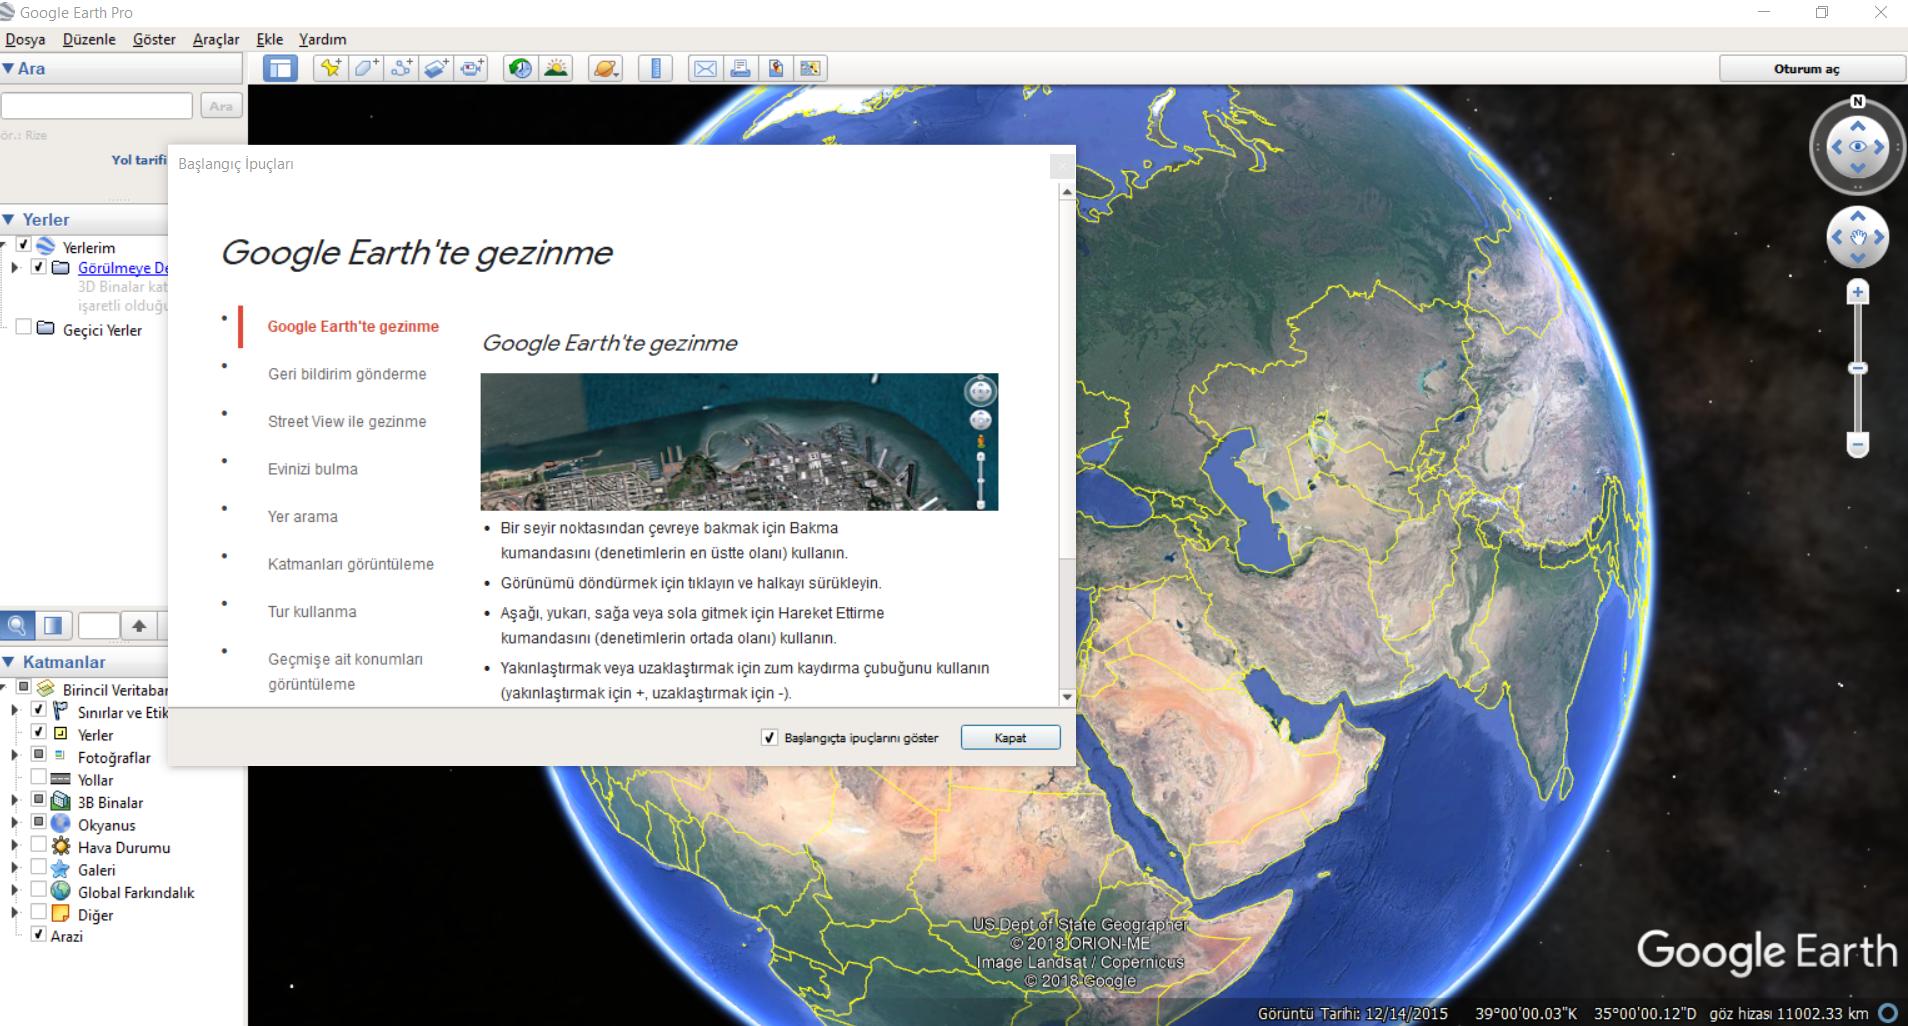 Google Earth Pro Gmail Gmail Giriş Gmaile Giriş Gmail Hesap